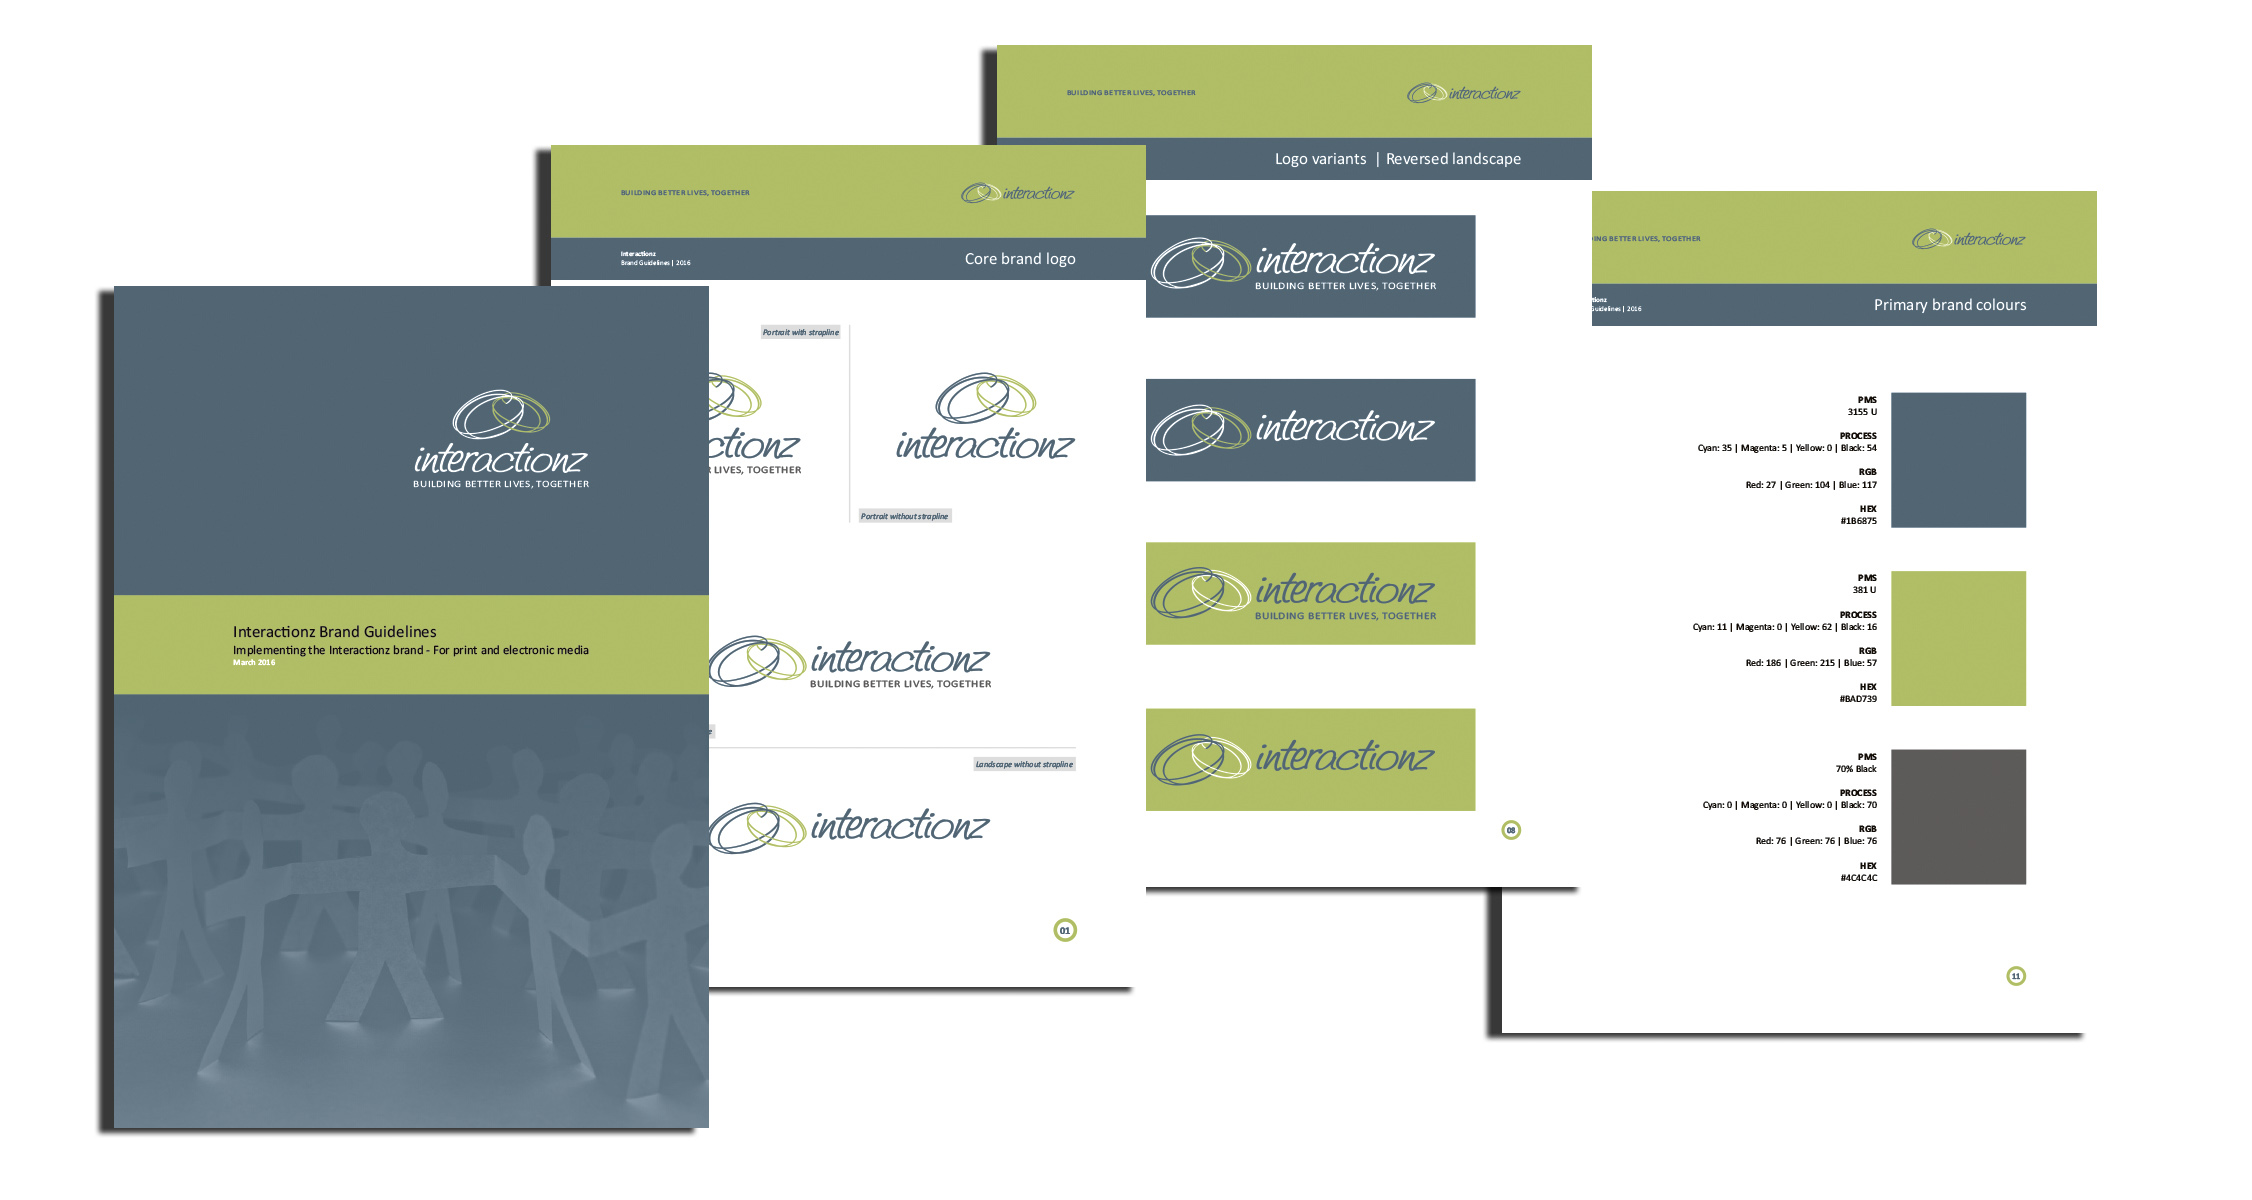 Intx Brand Guide.jpg